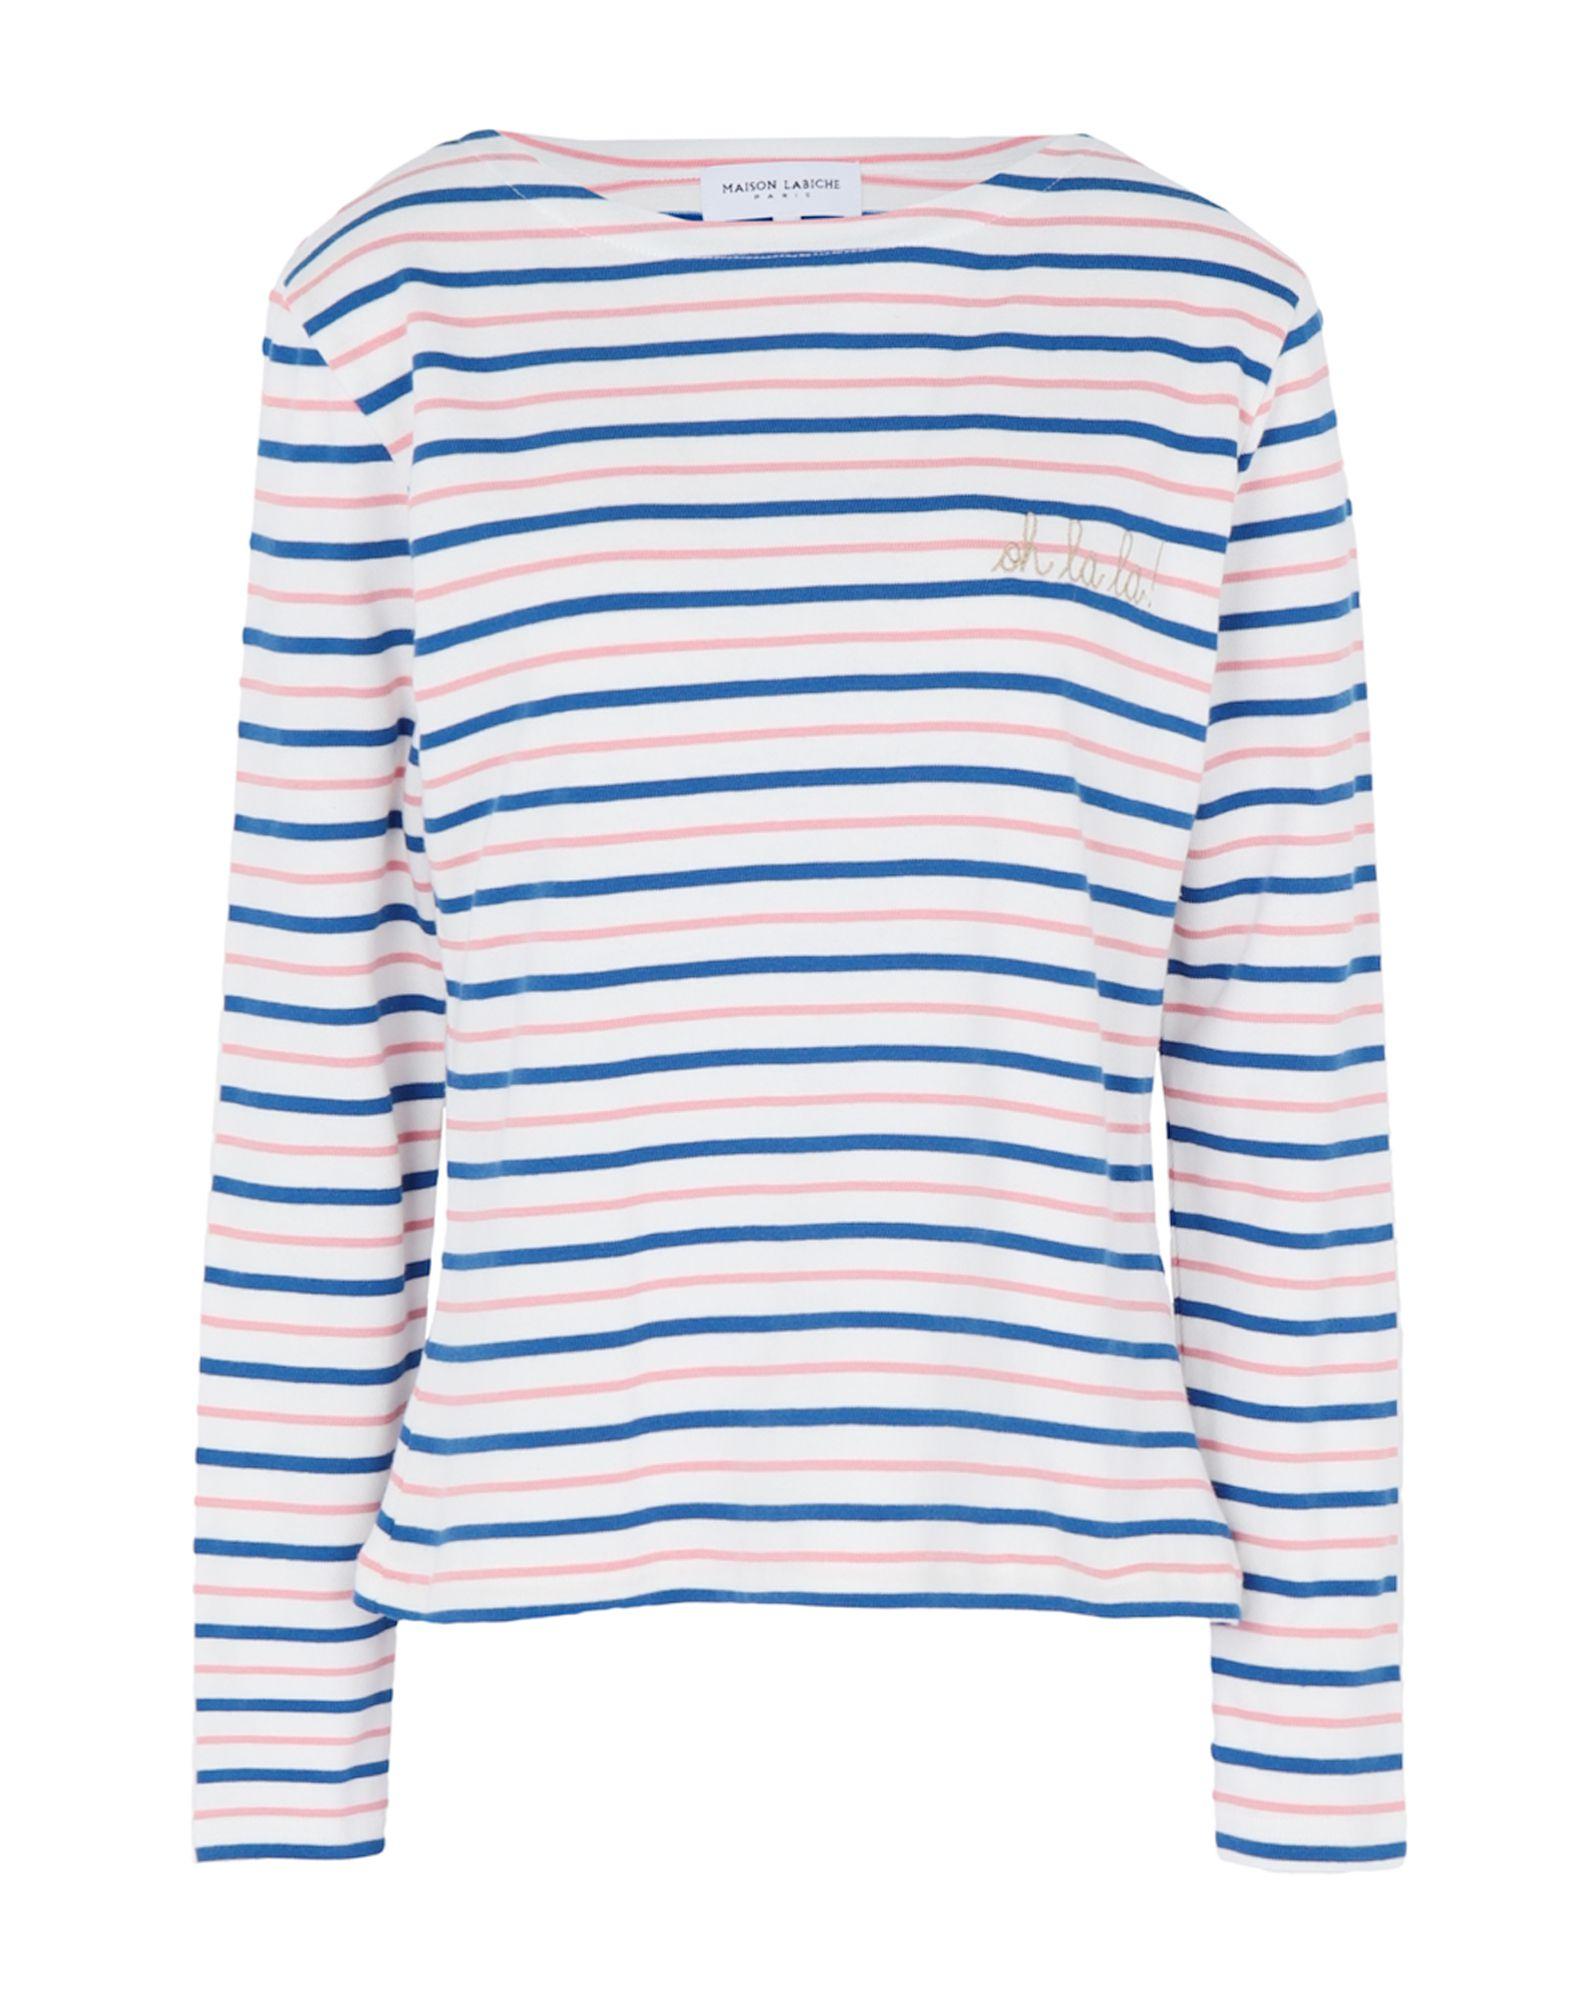 T-Shirt Maison Labiche Sailor Shirt Long Sleeves Oh L L L - donna - 12320906GX 06f